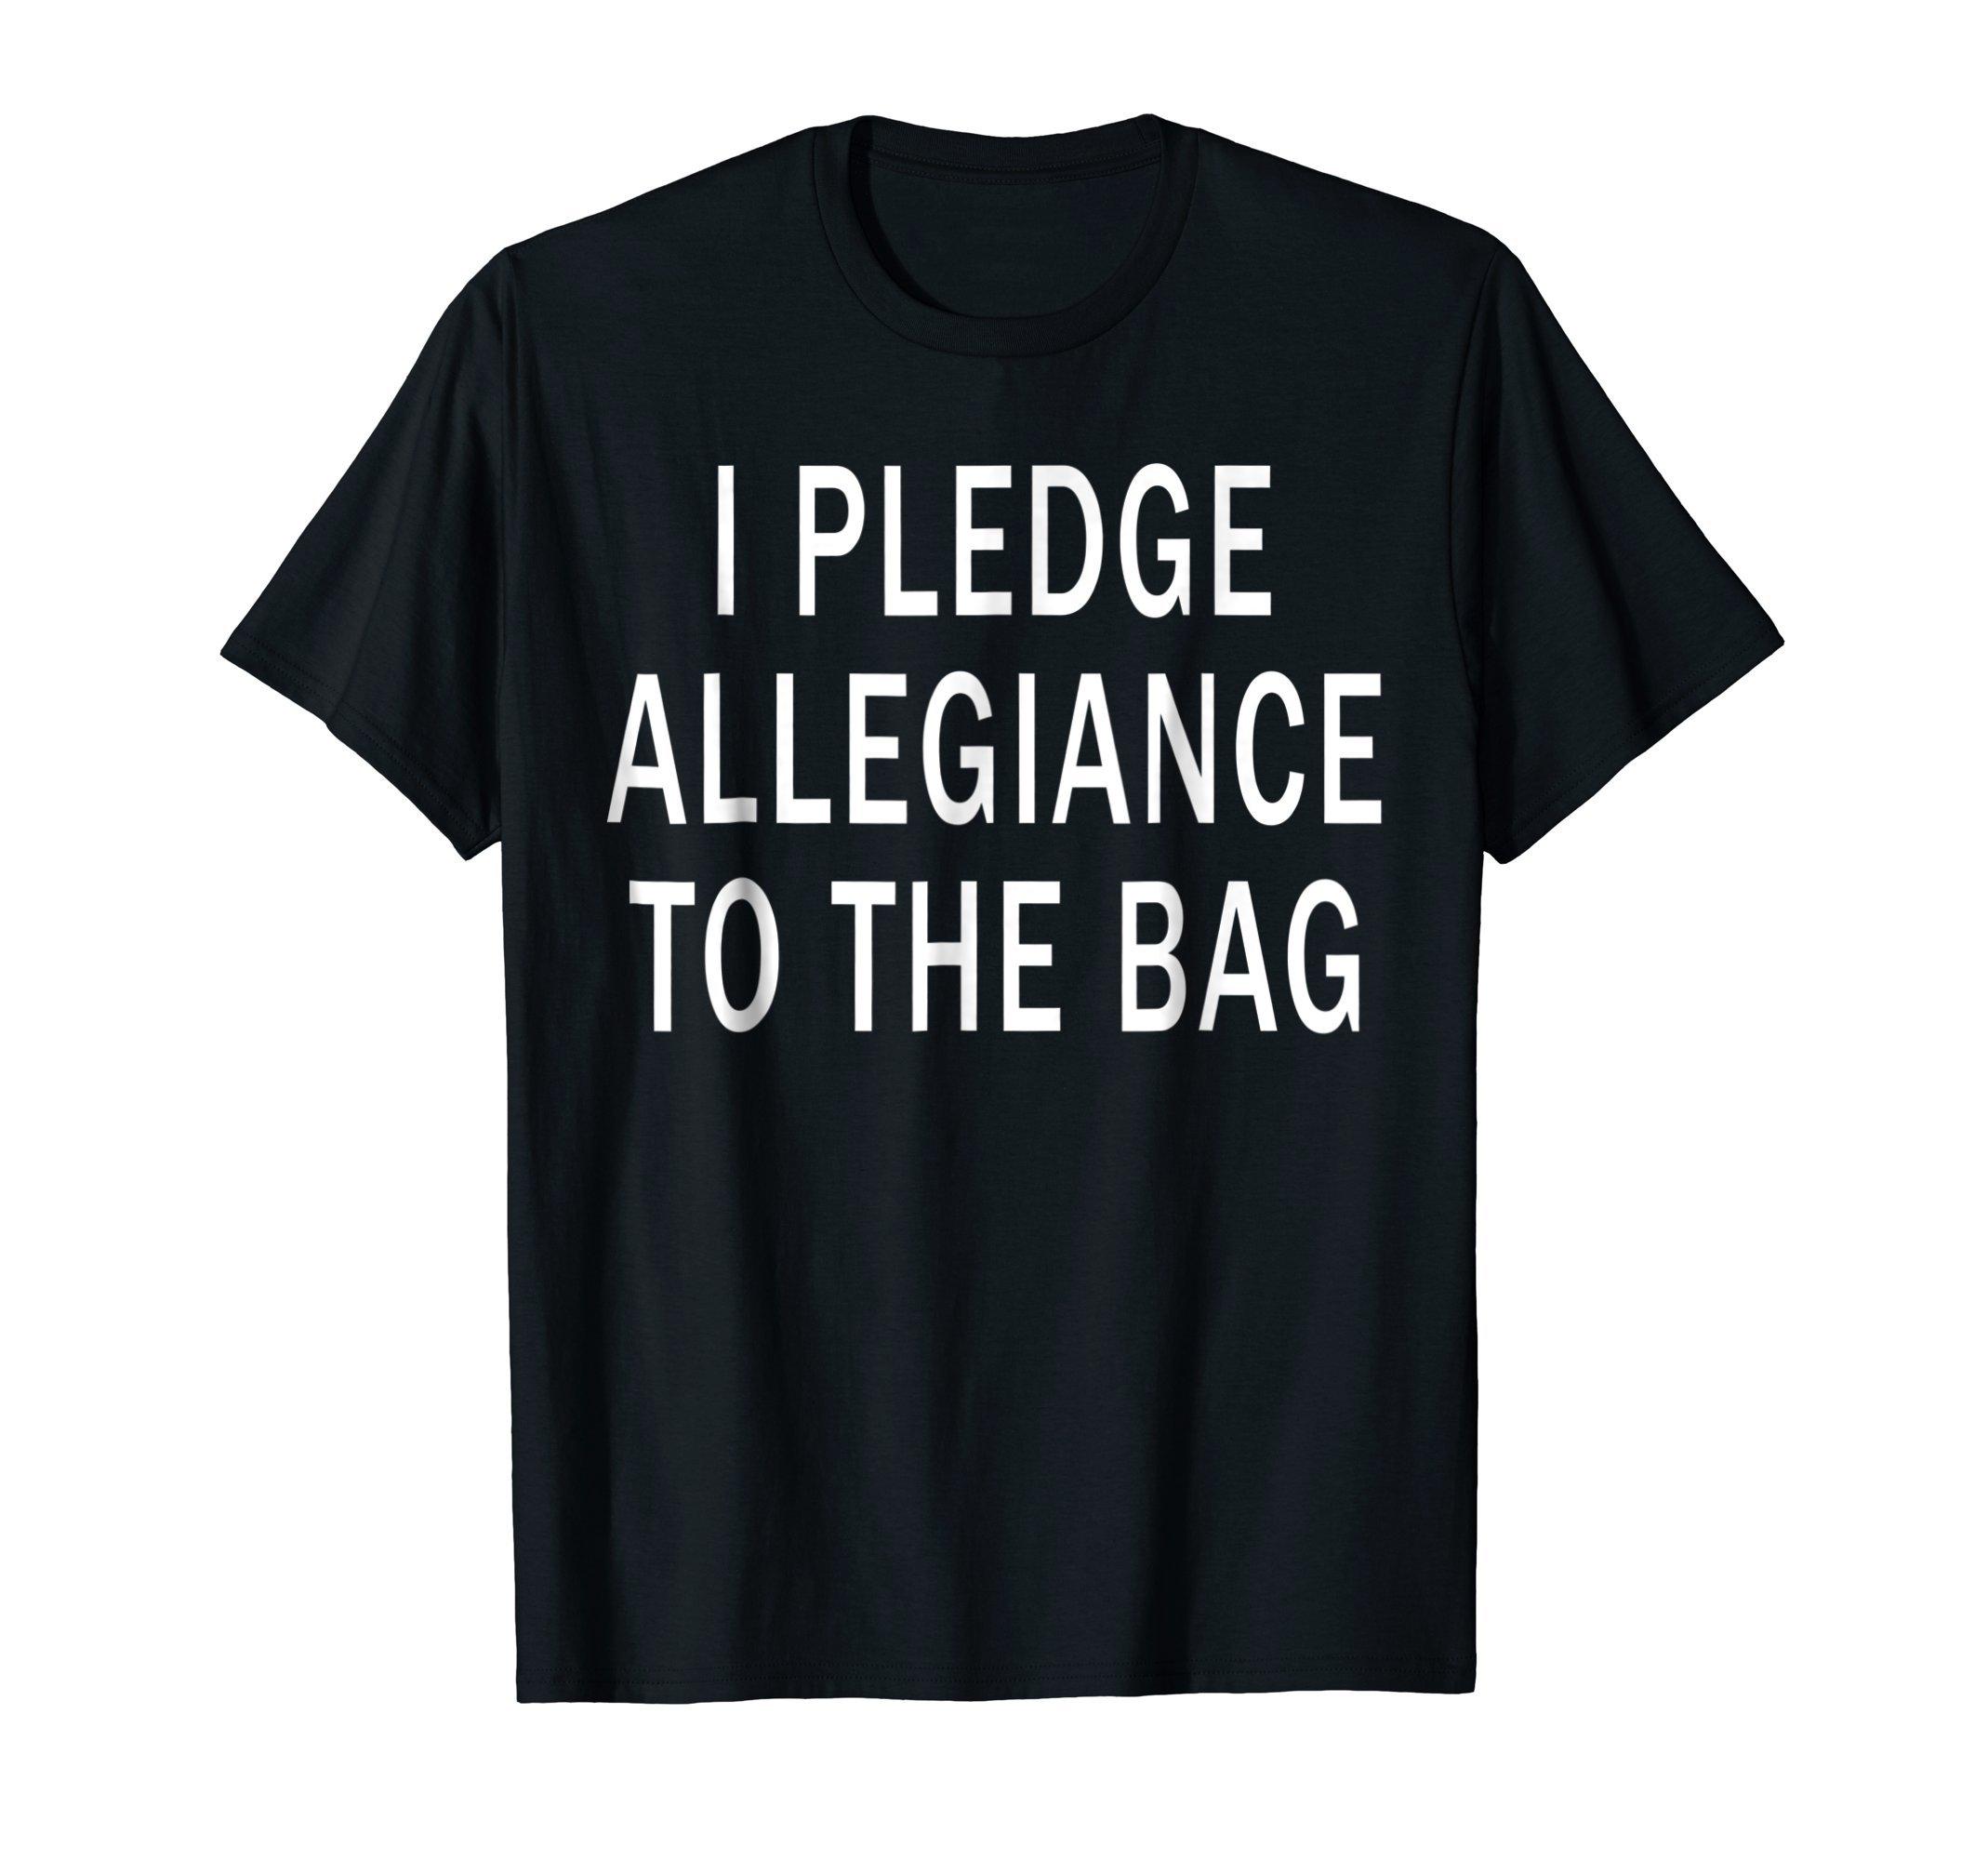 I Pledge Allegiance to the Bag T-shirt